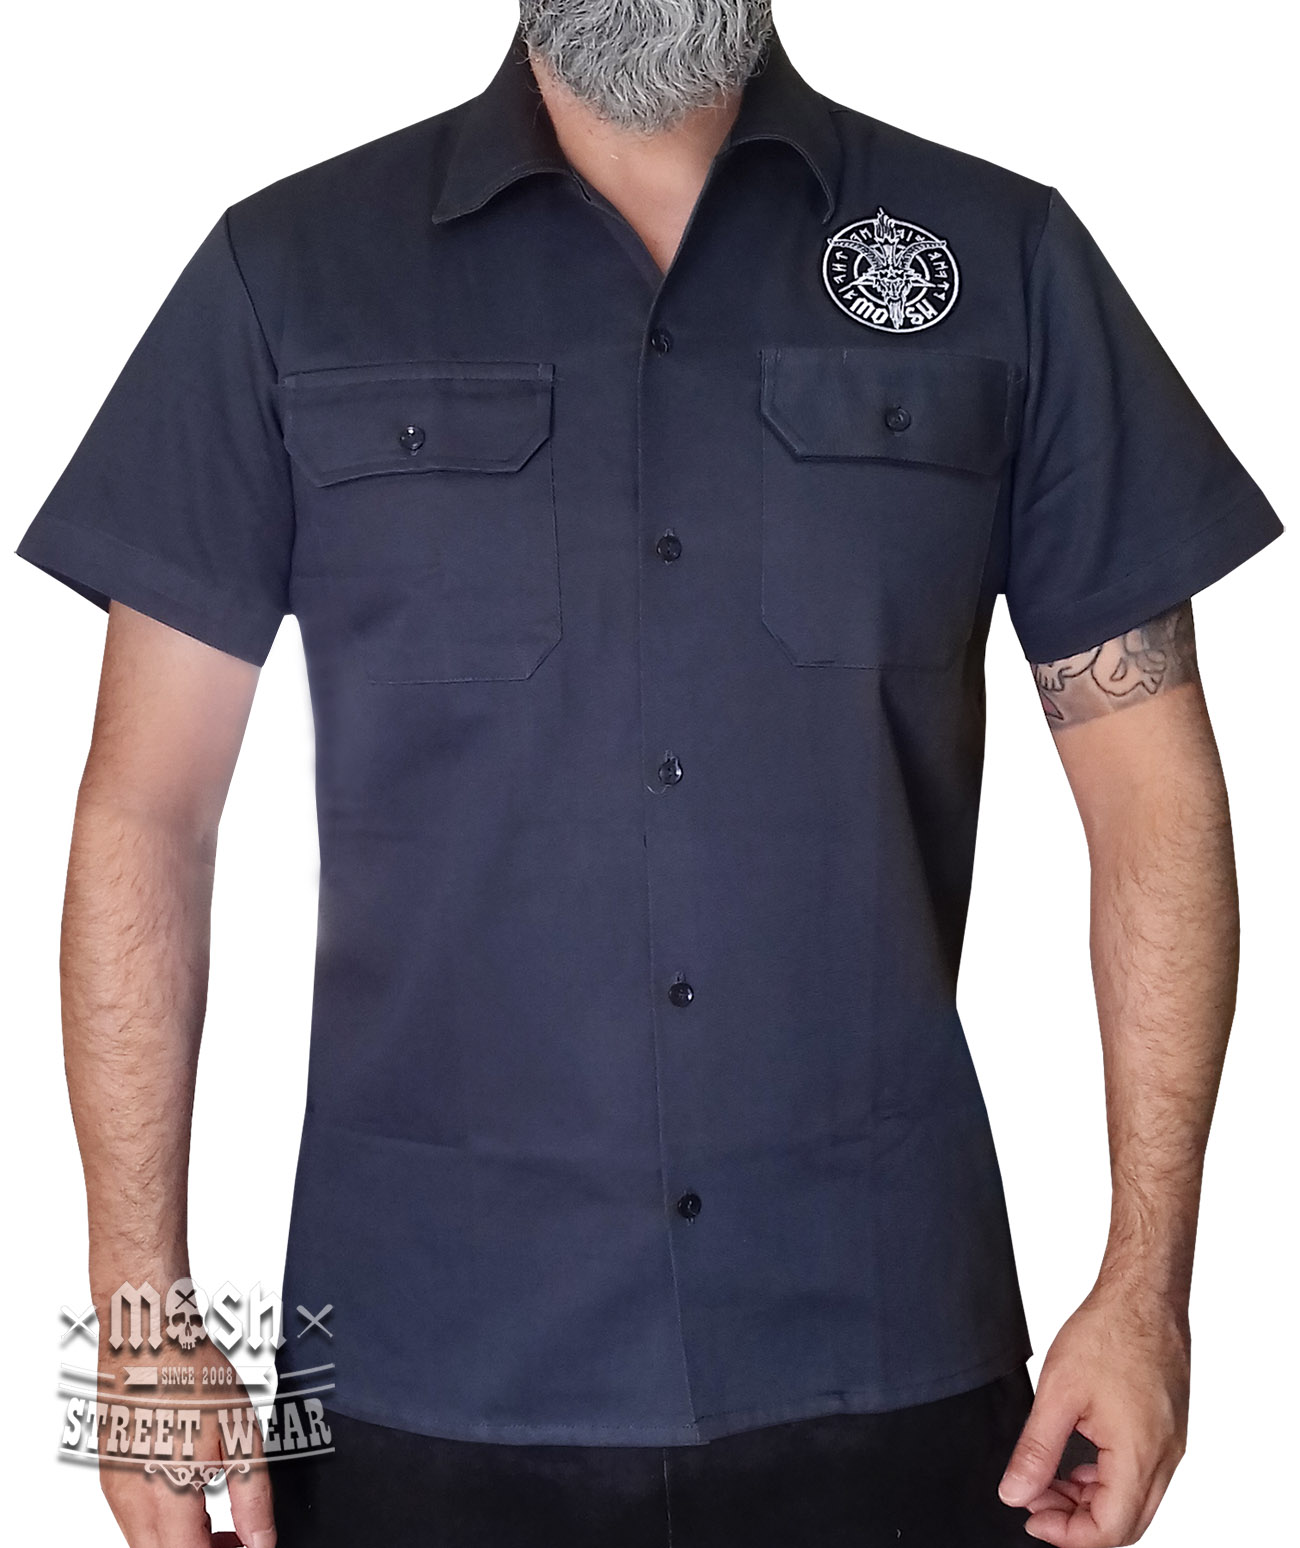 Camisa Worker King Goat